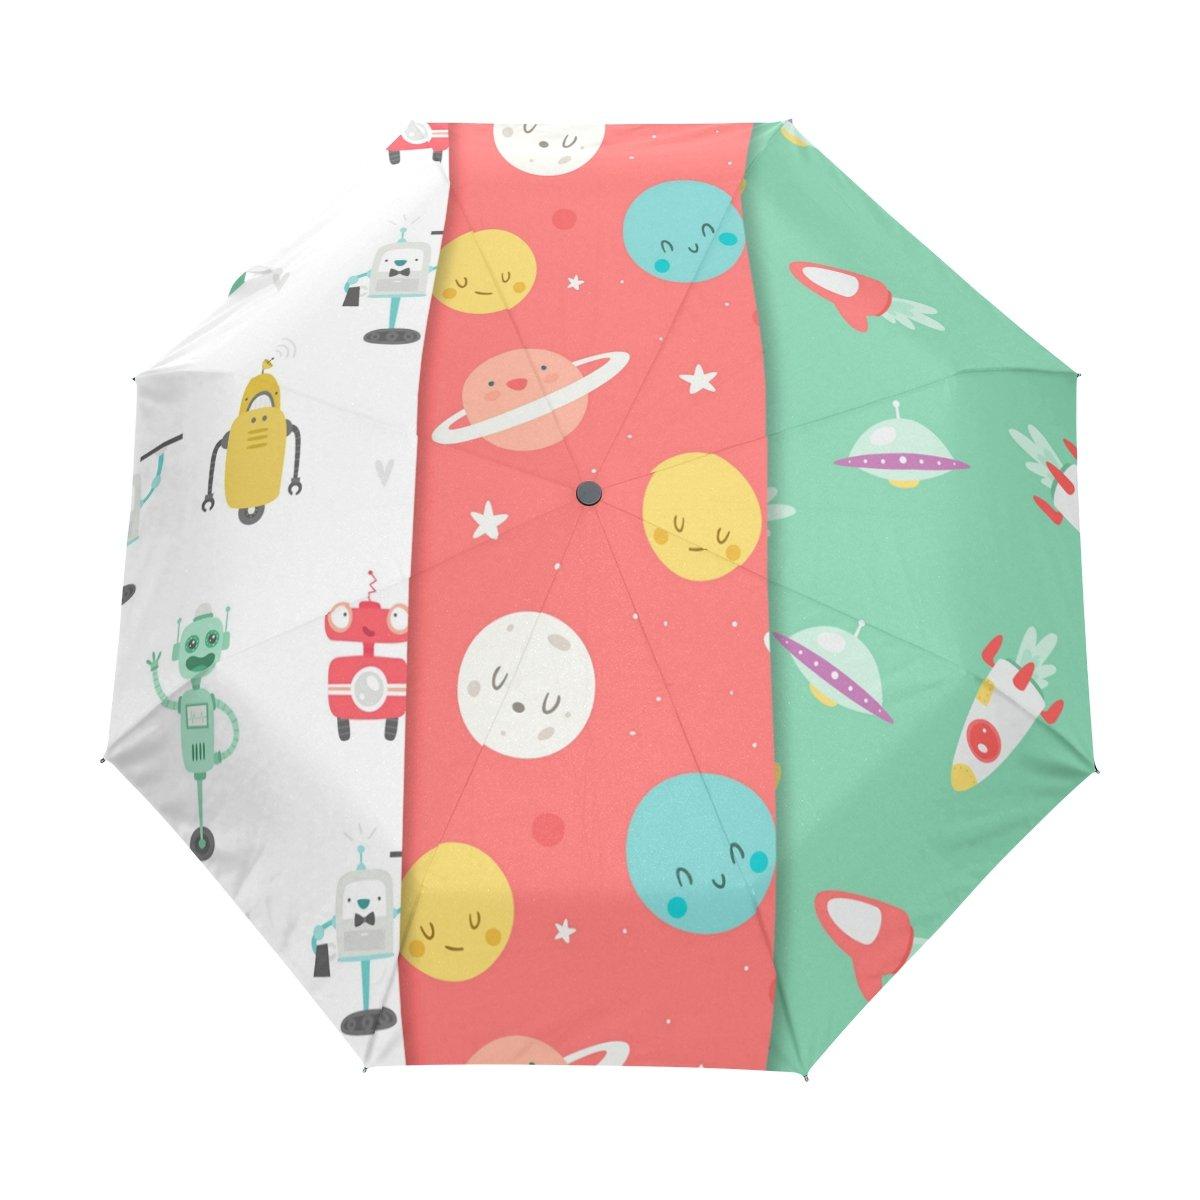 Senya Saobao防風と防雨トラベル傘with自動開いて閉じFolding Babyパターンコレクションポータブル折りたたみ式太陽雨傘 B07FP1VMRV